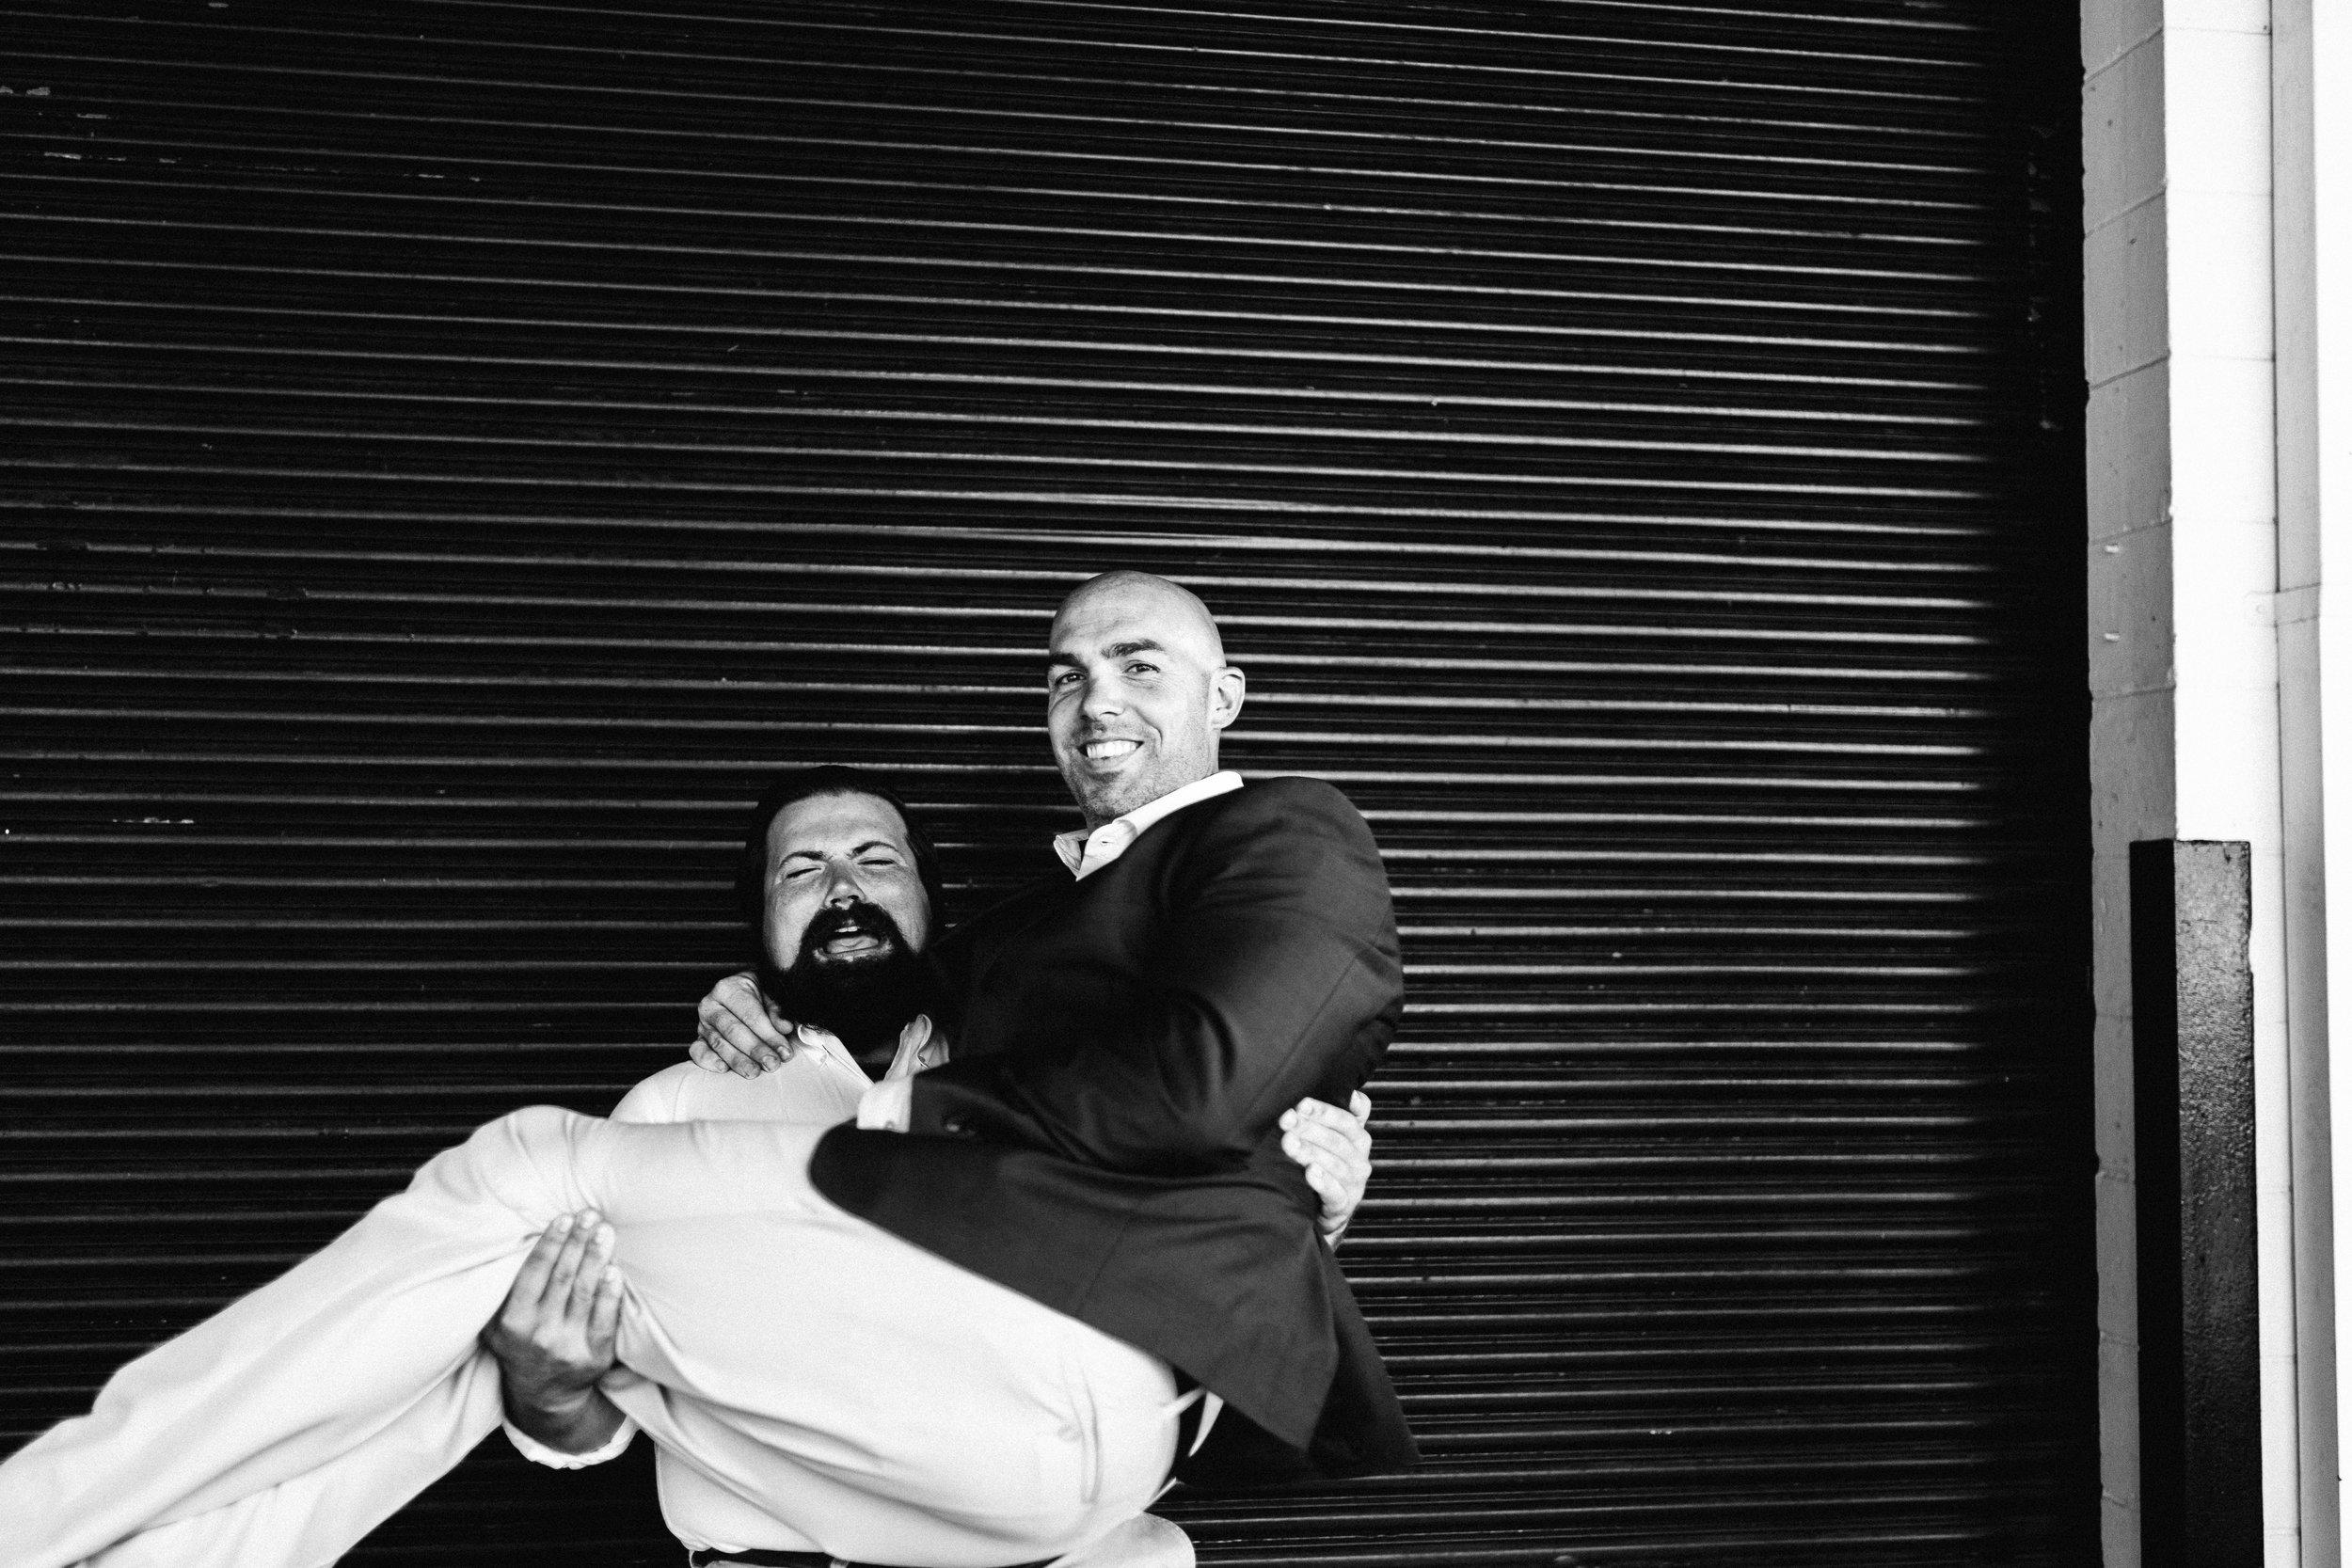 2017.09.16 Ashley and Chuck O'Day Quantam Leap Winery Wedding (256 of 462).jpg